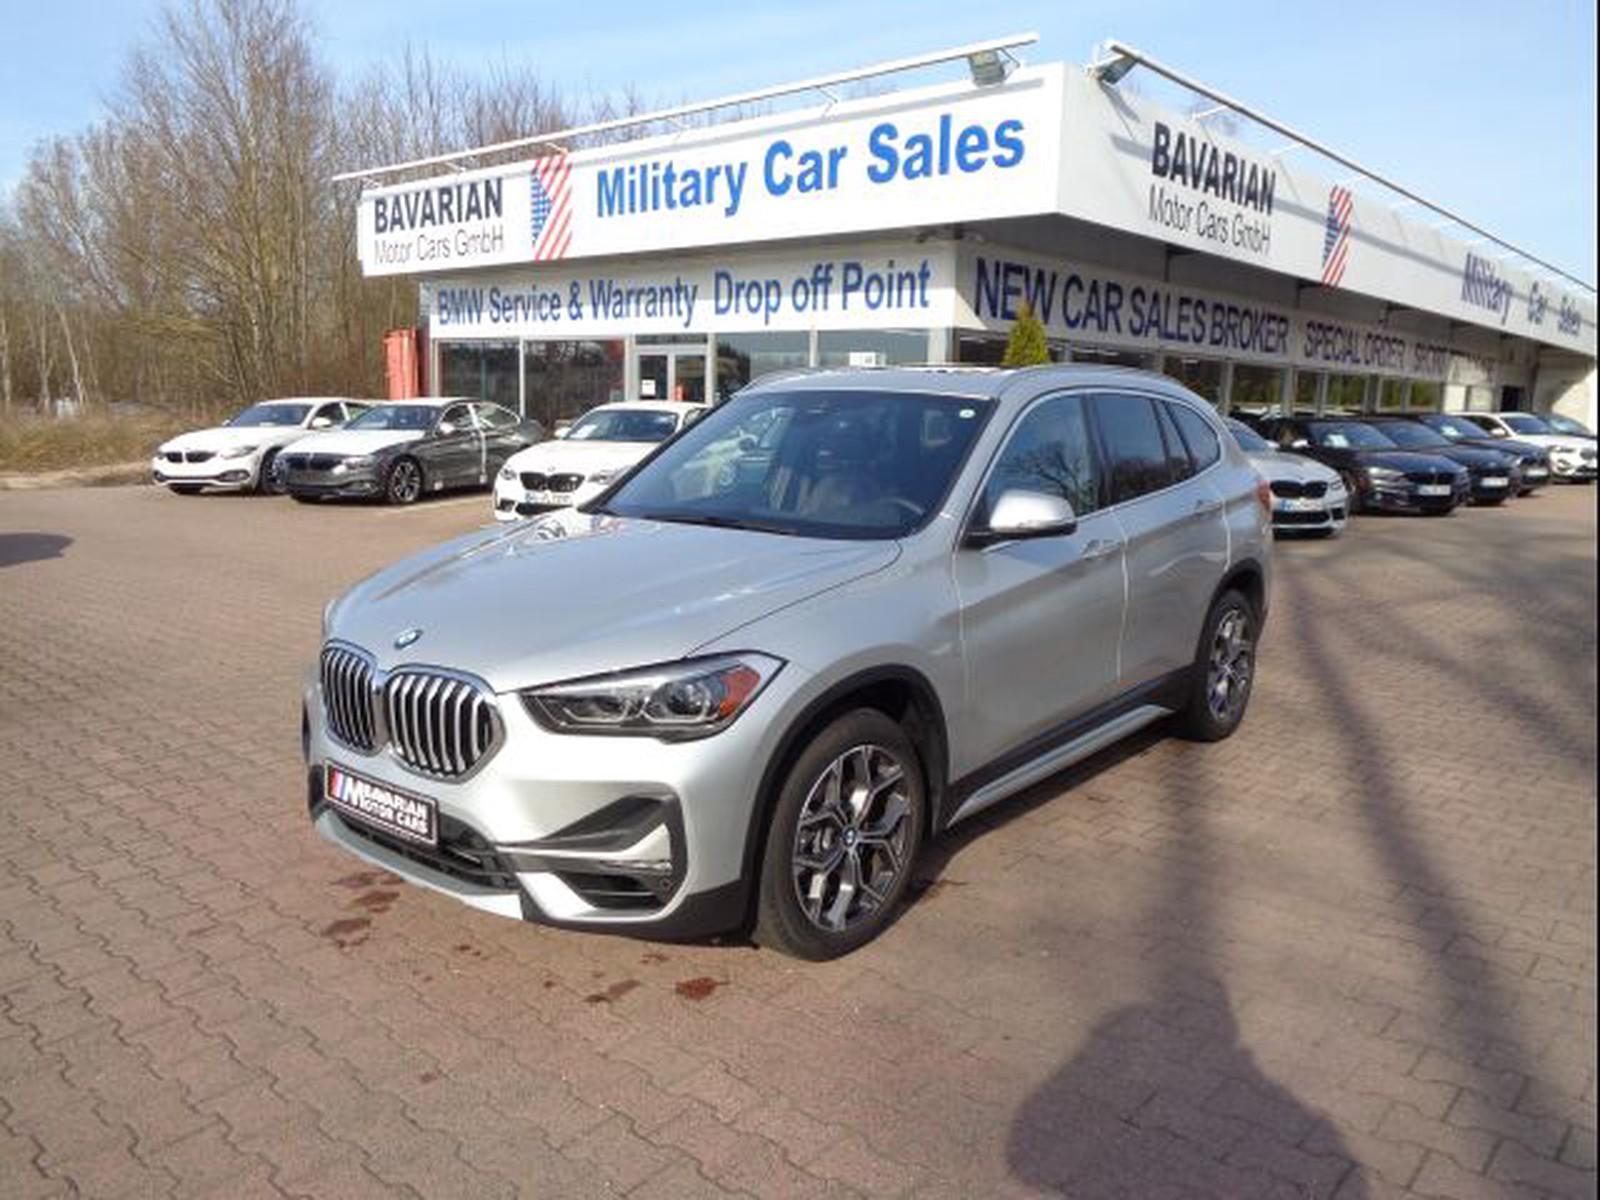 Bmw X1 Xdrive 28i Tax Free Military Sales In Ramstein Miesenbach Price 33995 Usd Int Nr U 16120 Sold